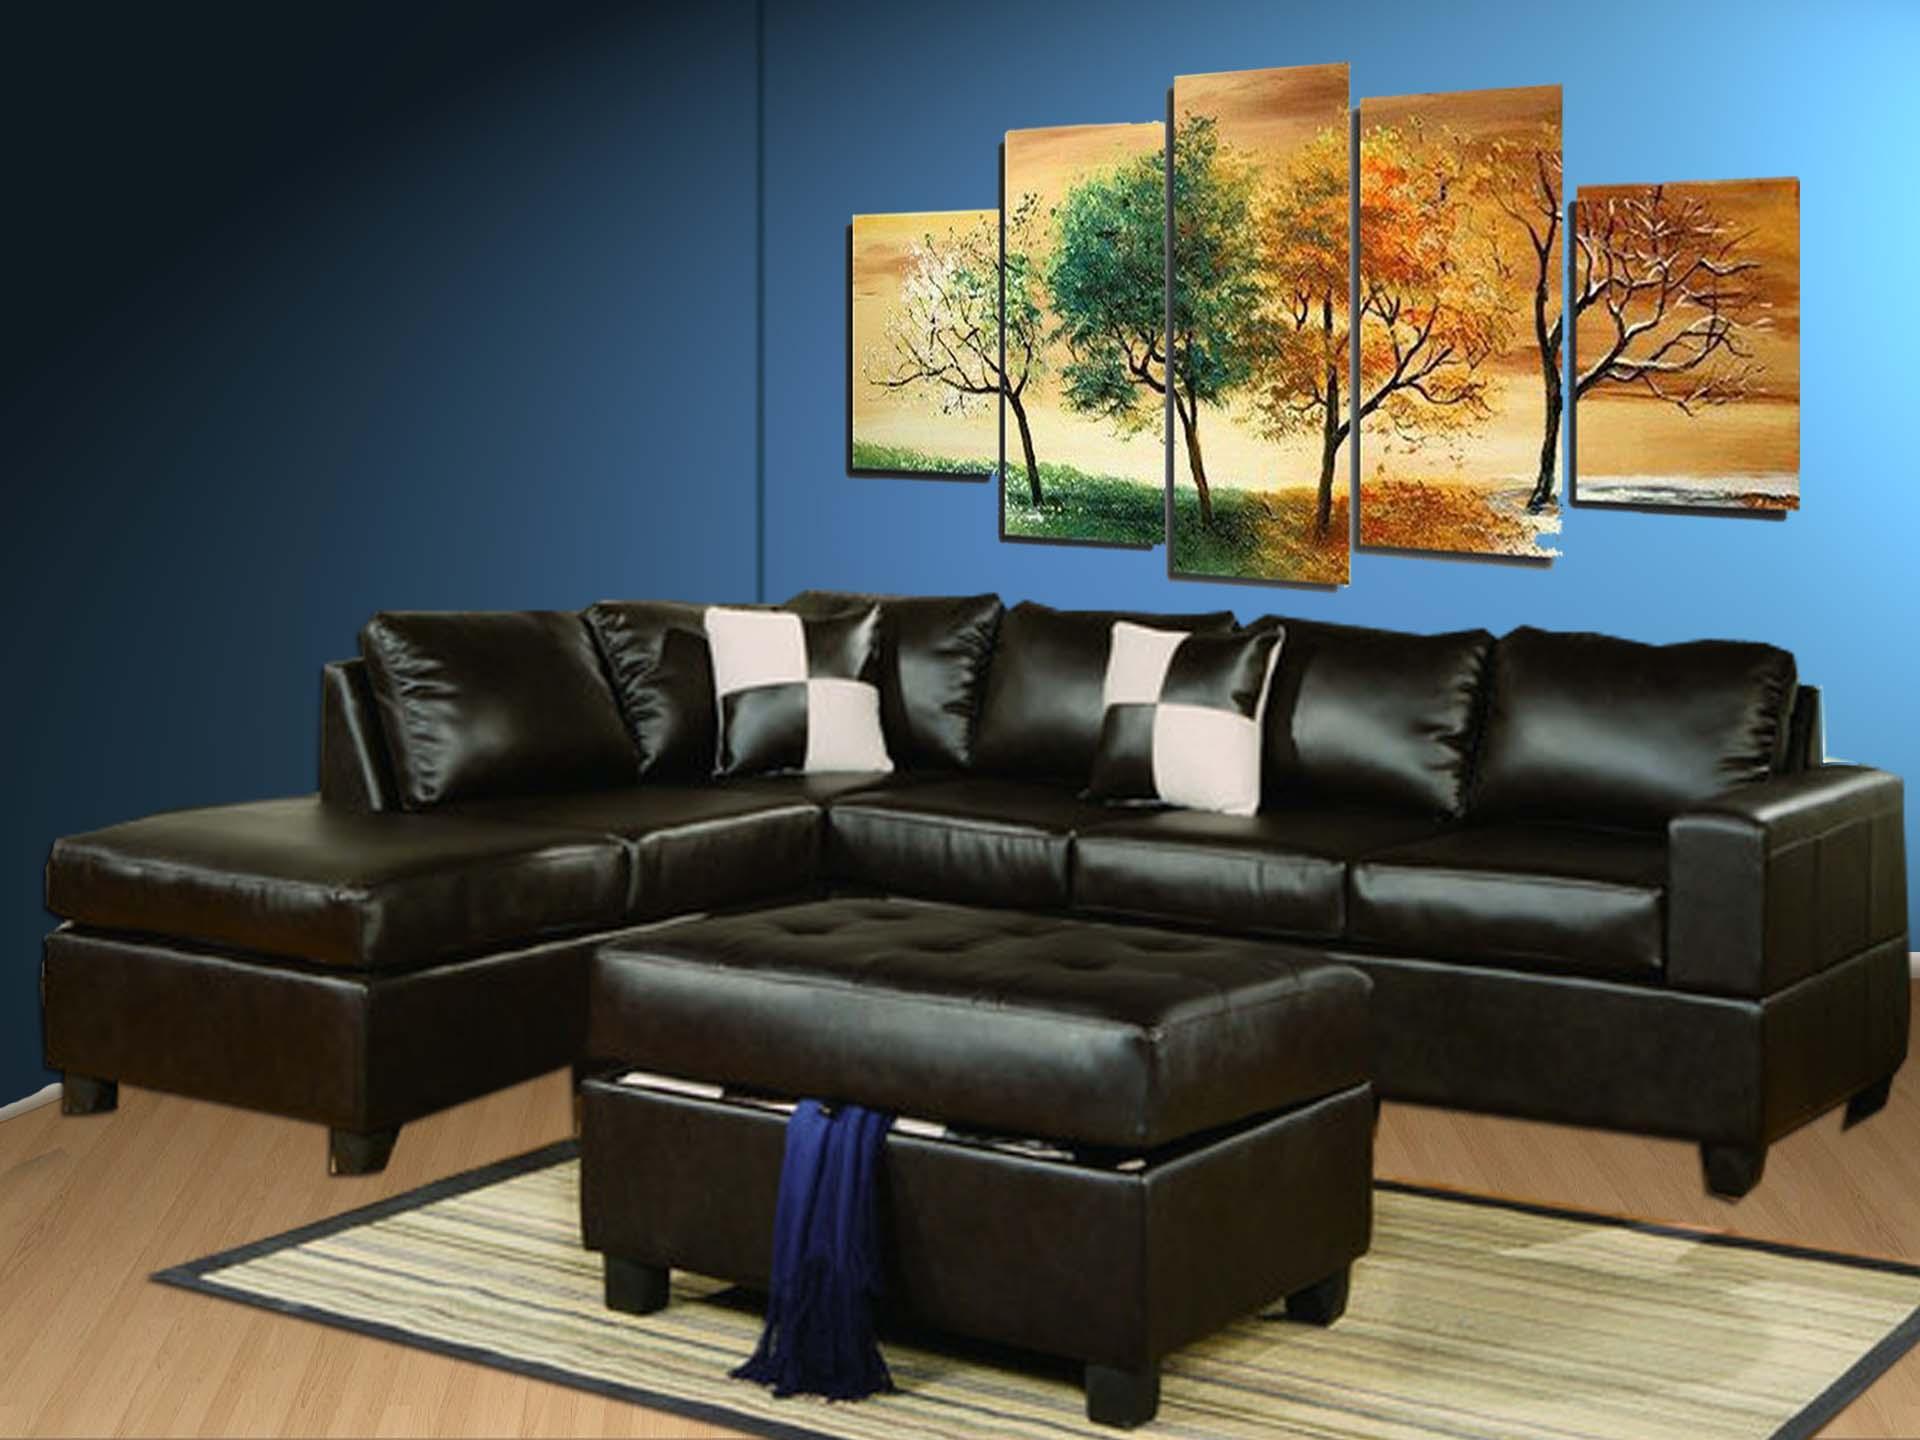 Leather Sofa Repair Perth Wa Review Home Co